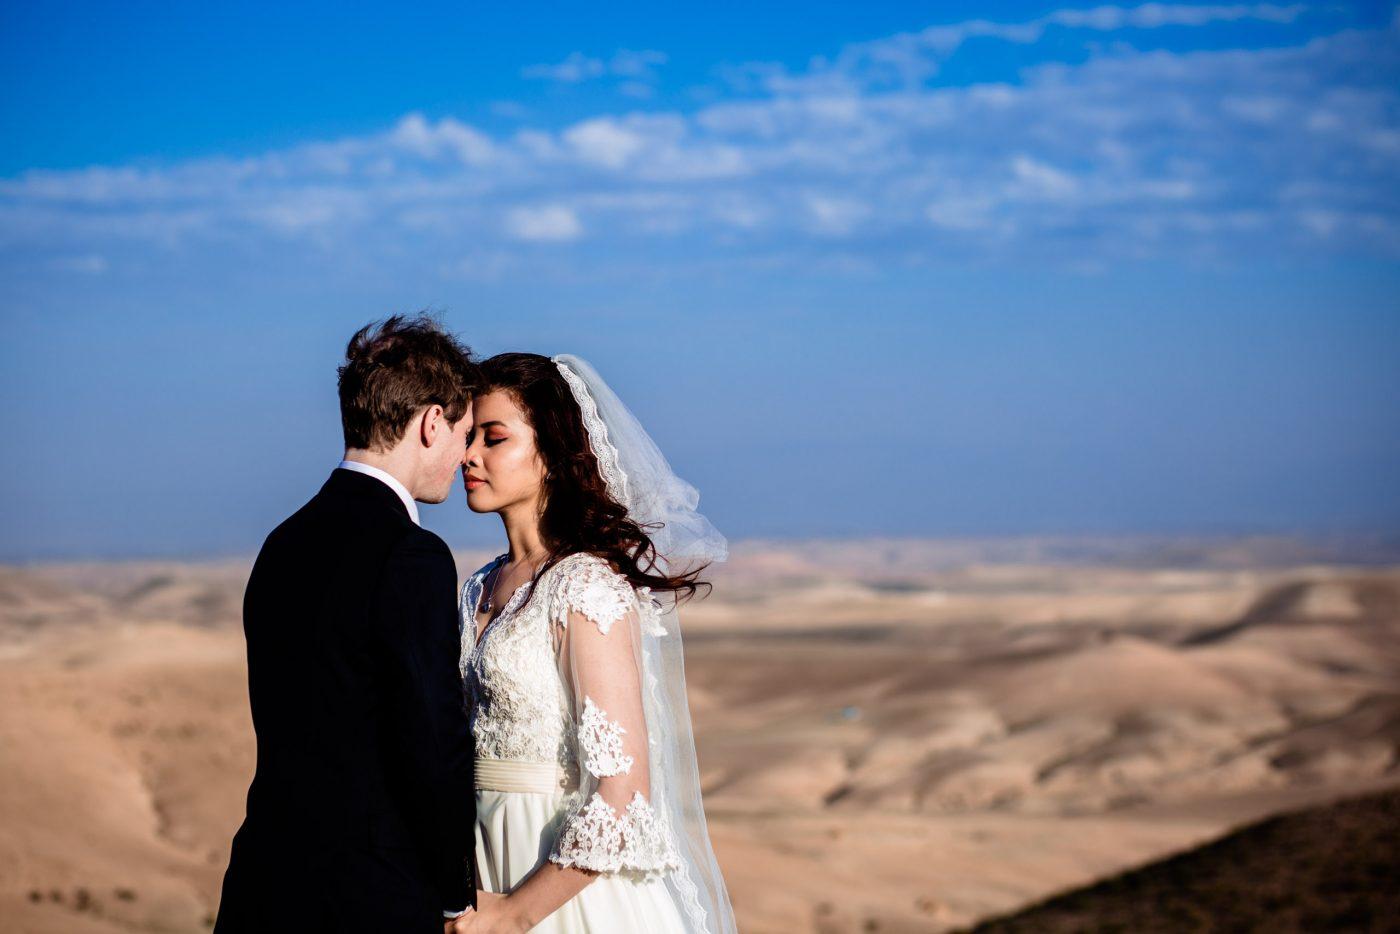 Beautiful Destination Wedding photography in Agafay Desert Marrakech